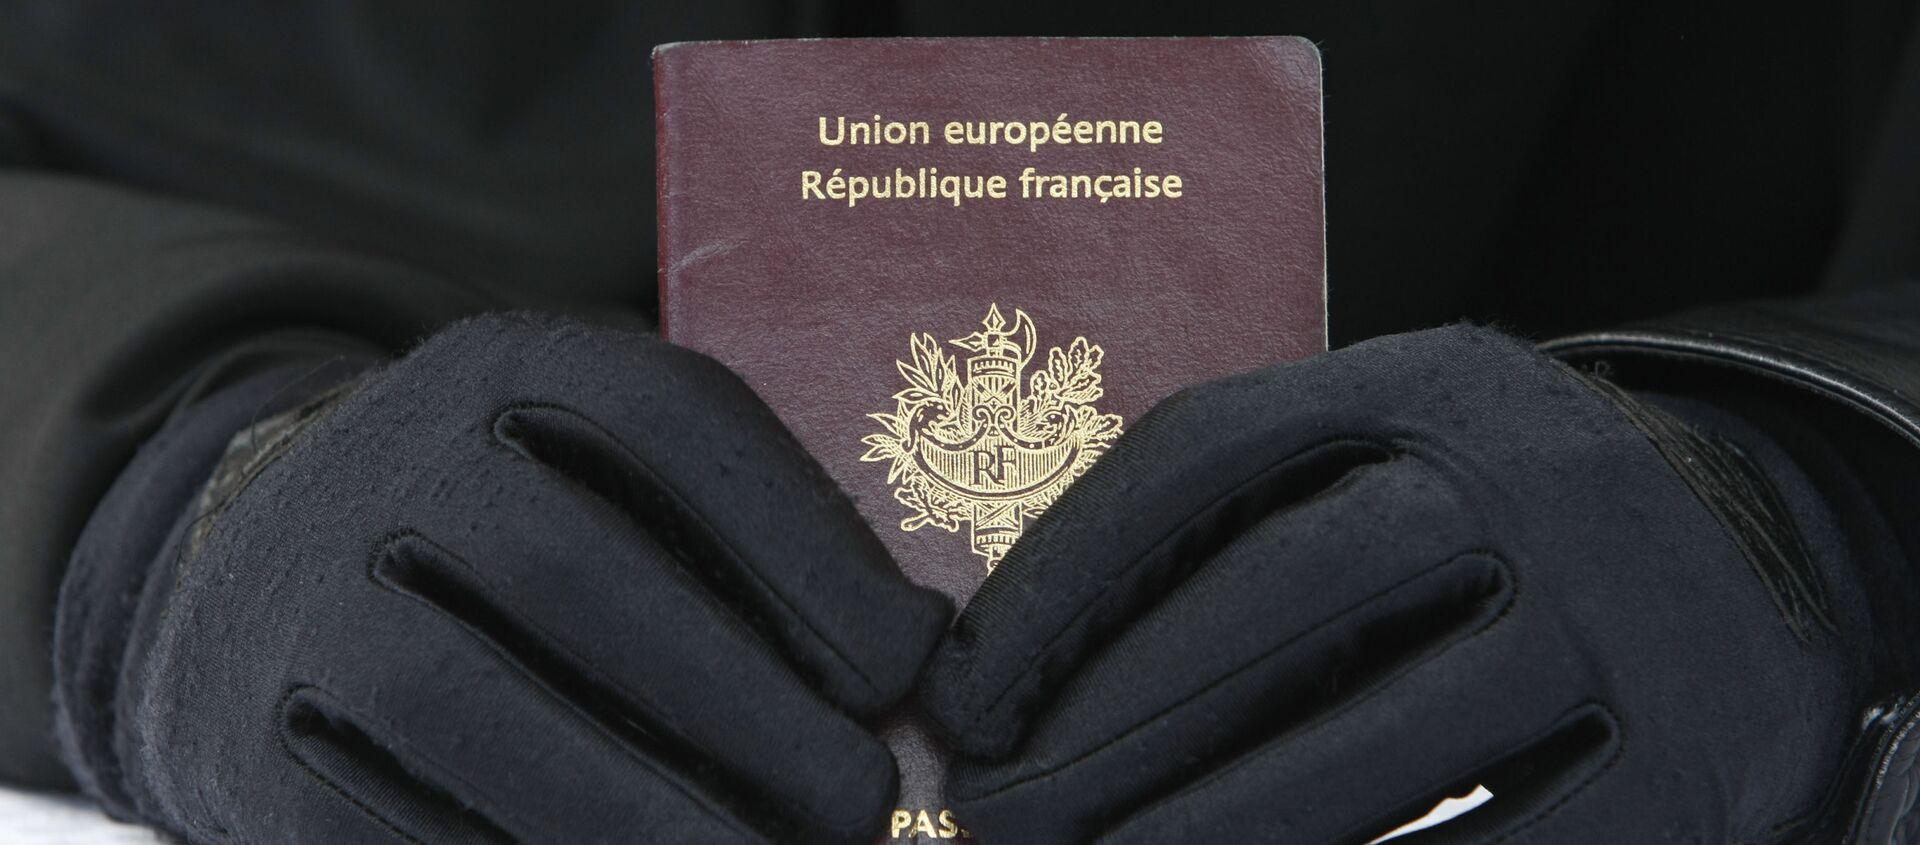 Passeport français - Sputnik France, 1920, 17.02.2021